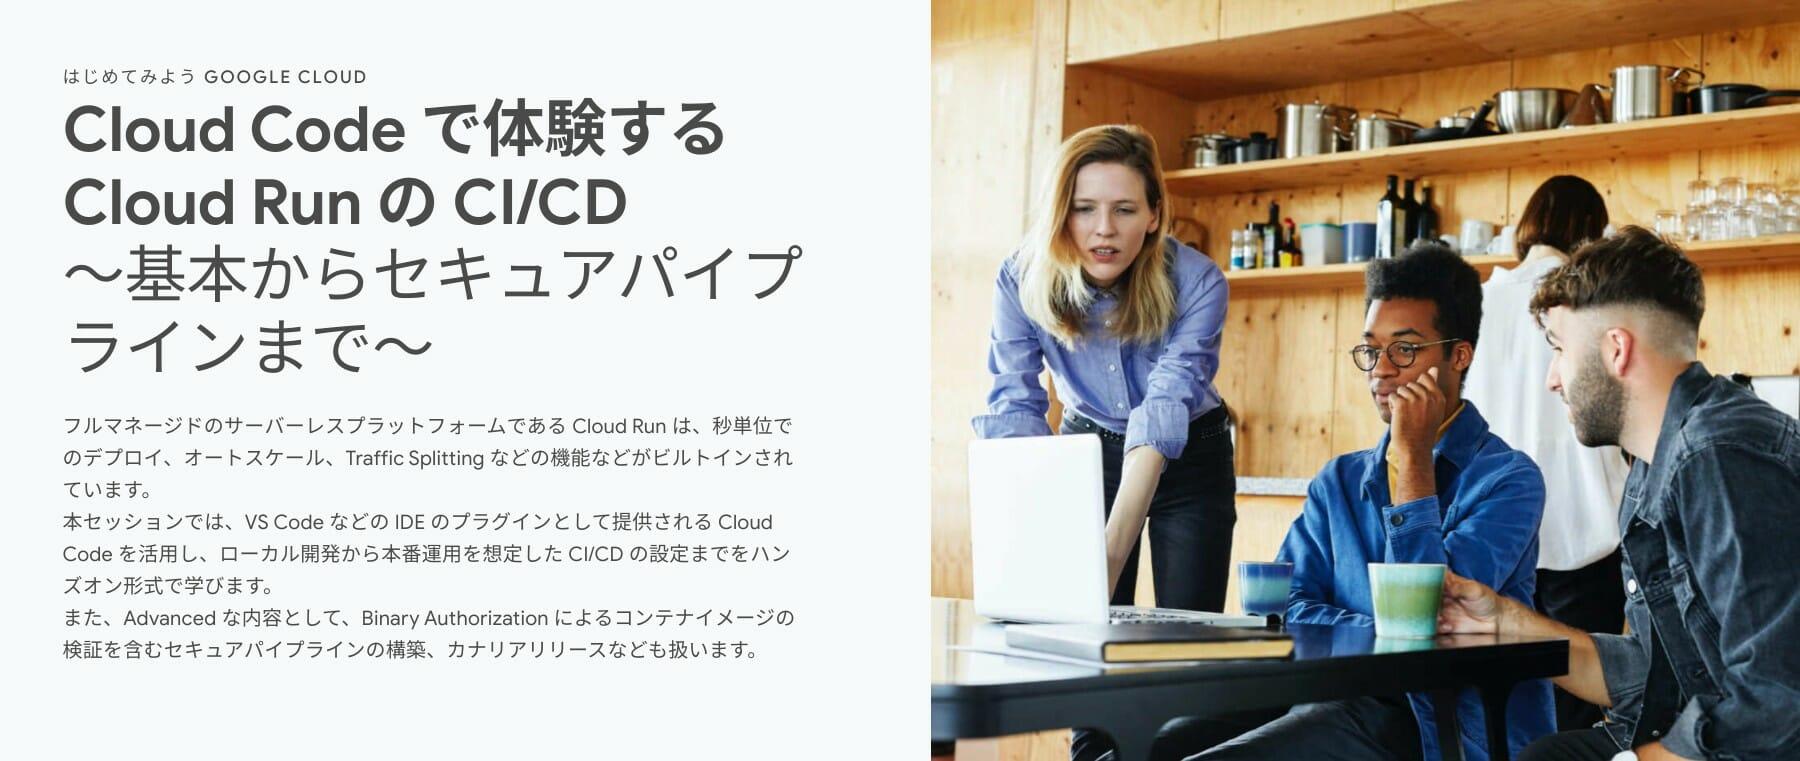 [GCP] Cloud Code で体験する Cloud Run の CI/CD 〜基本からセキュアパイプラインまで〜